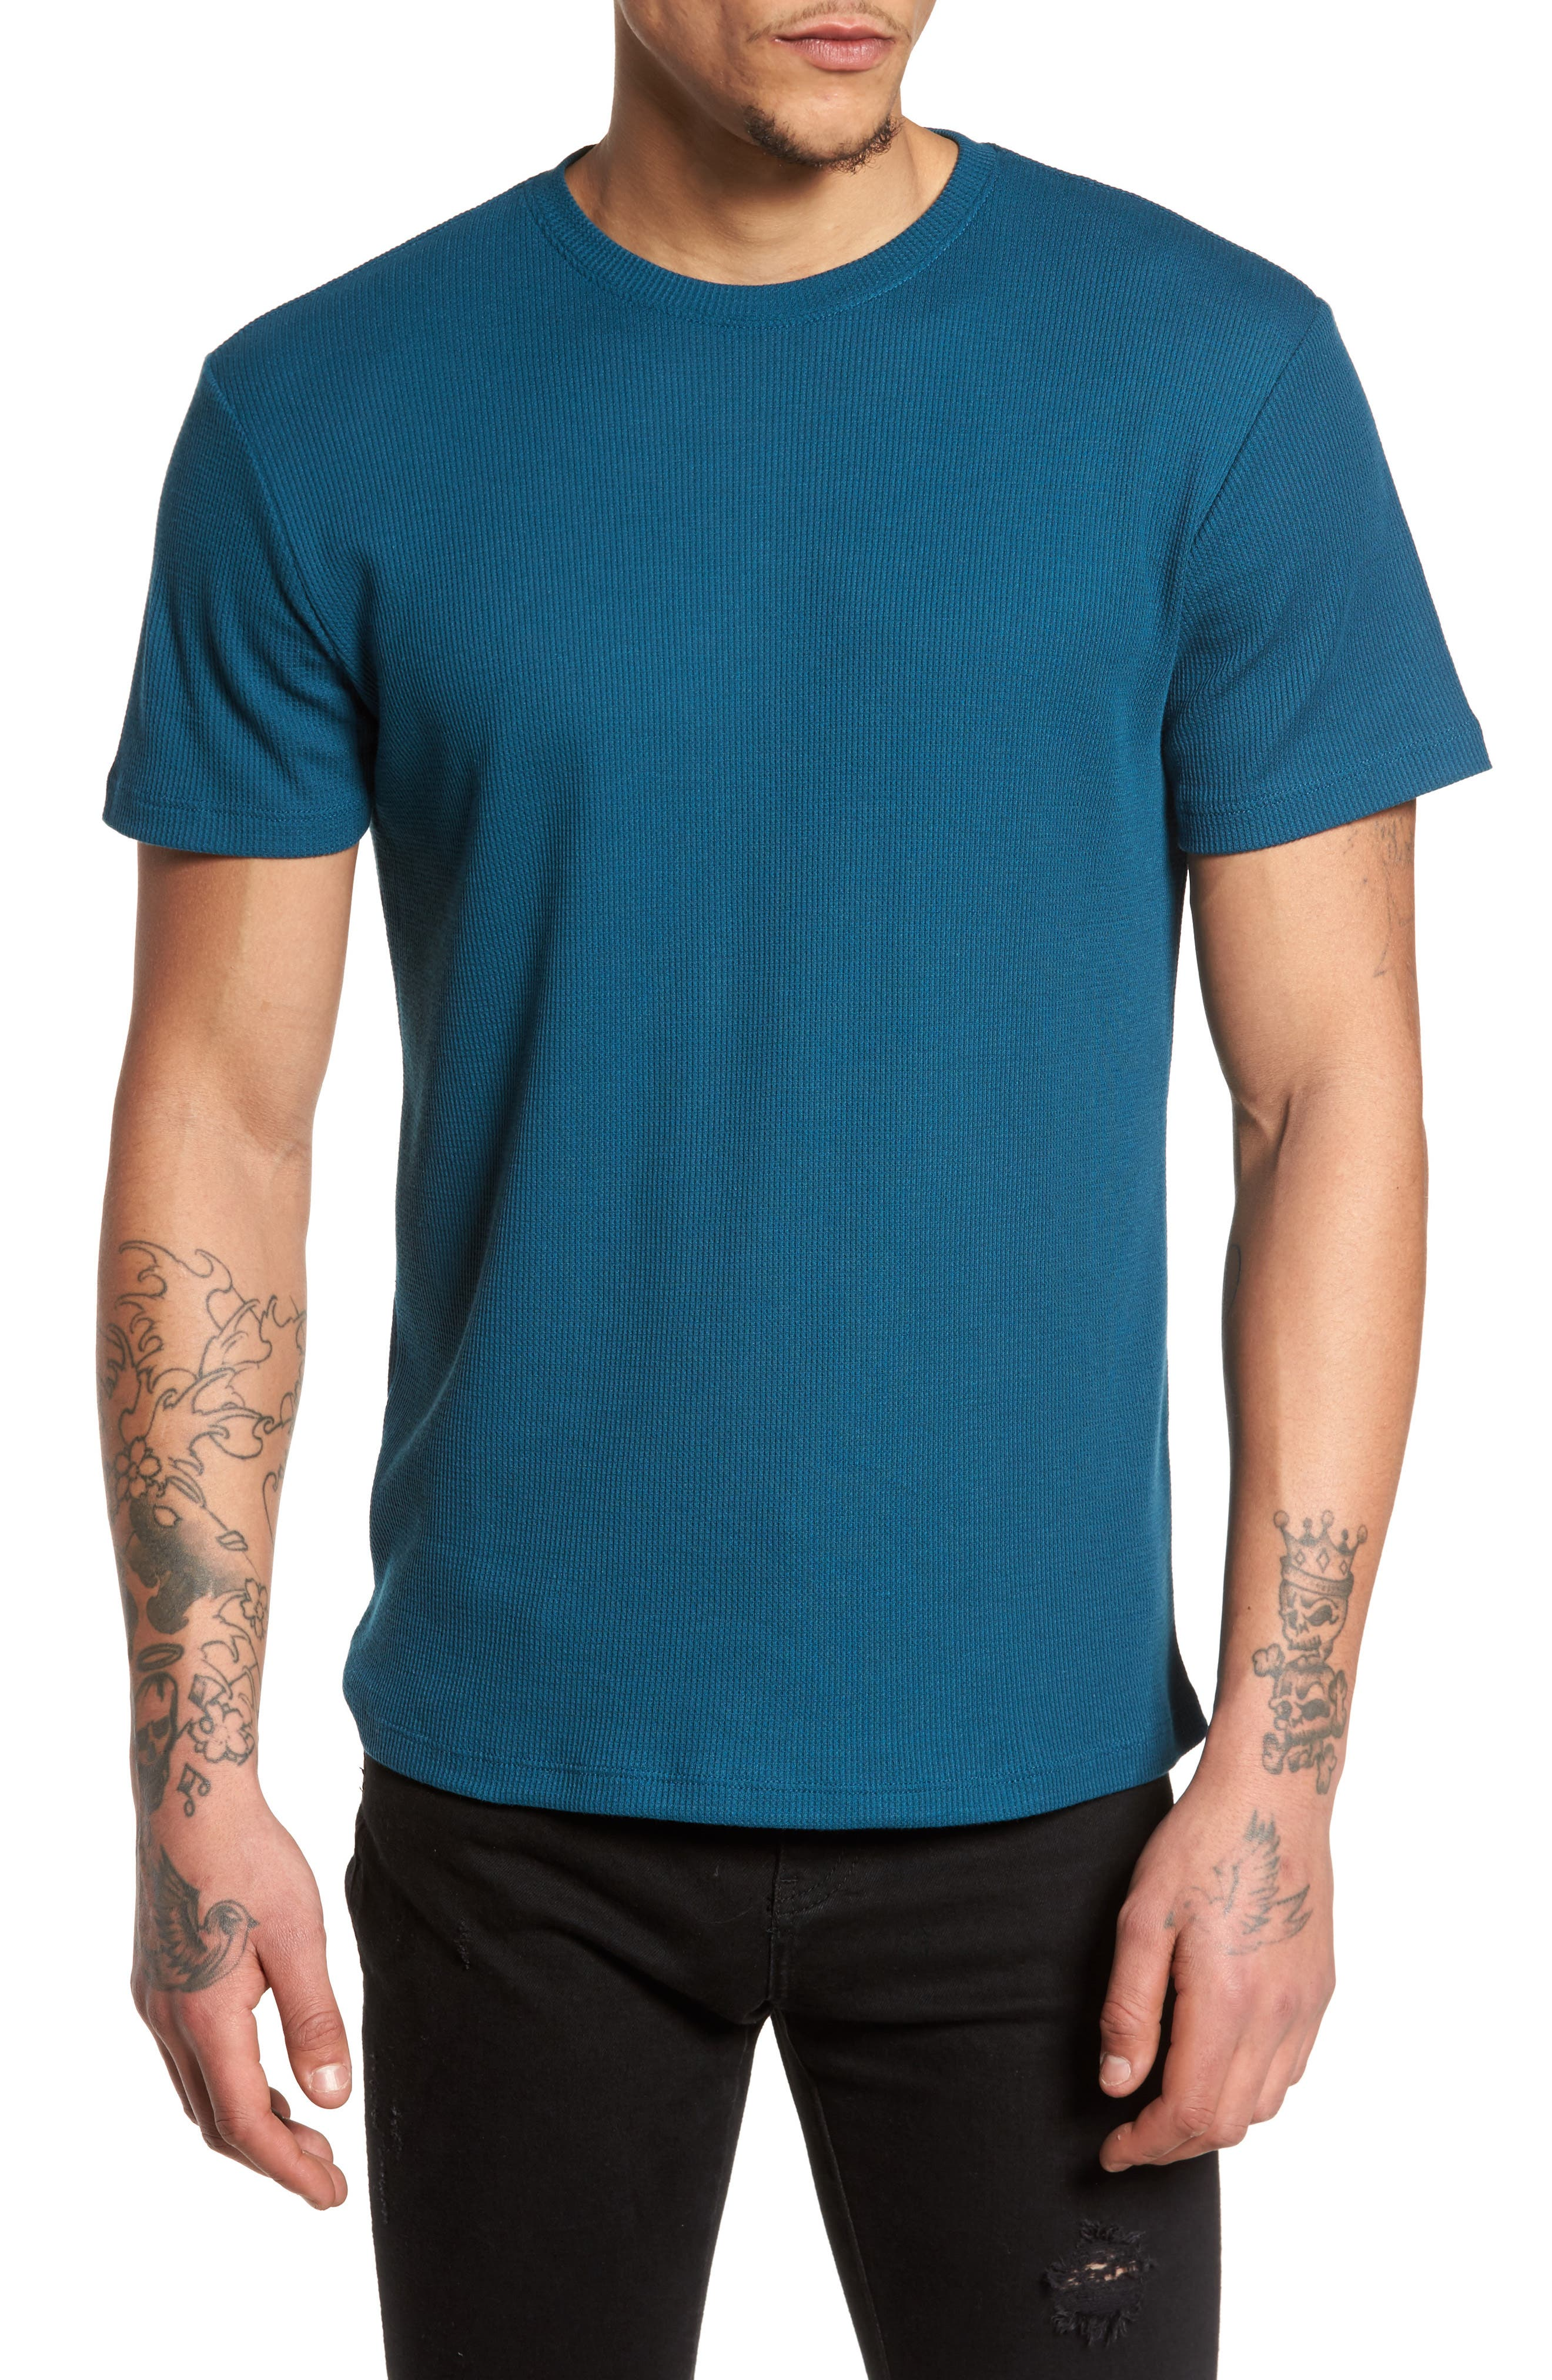 The Rail Thermal T-Shirt